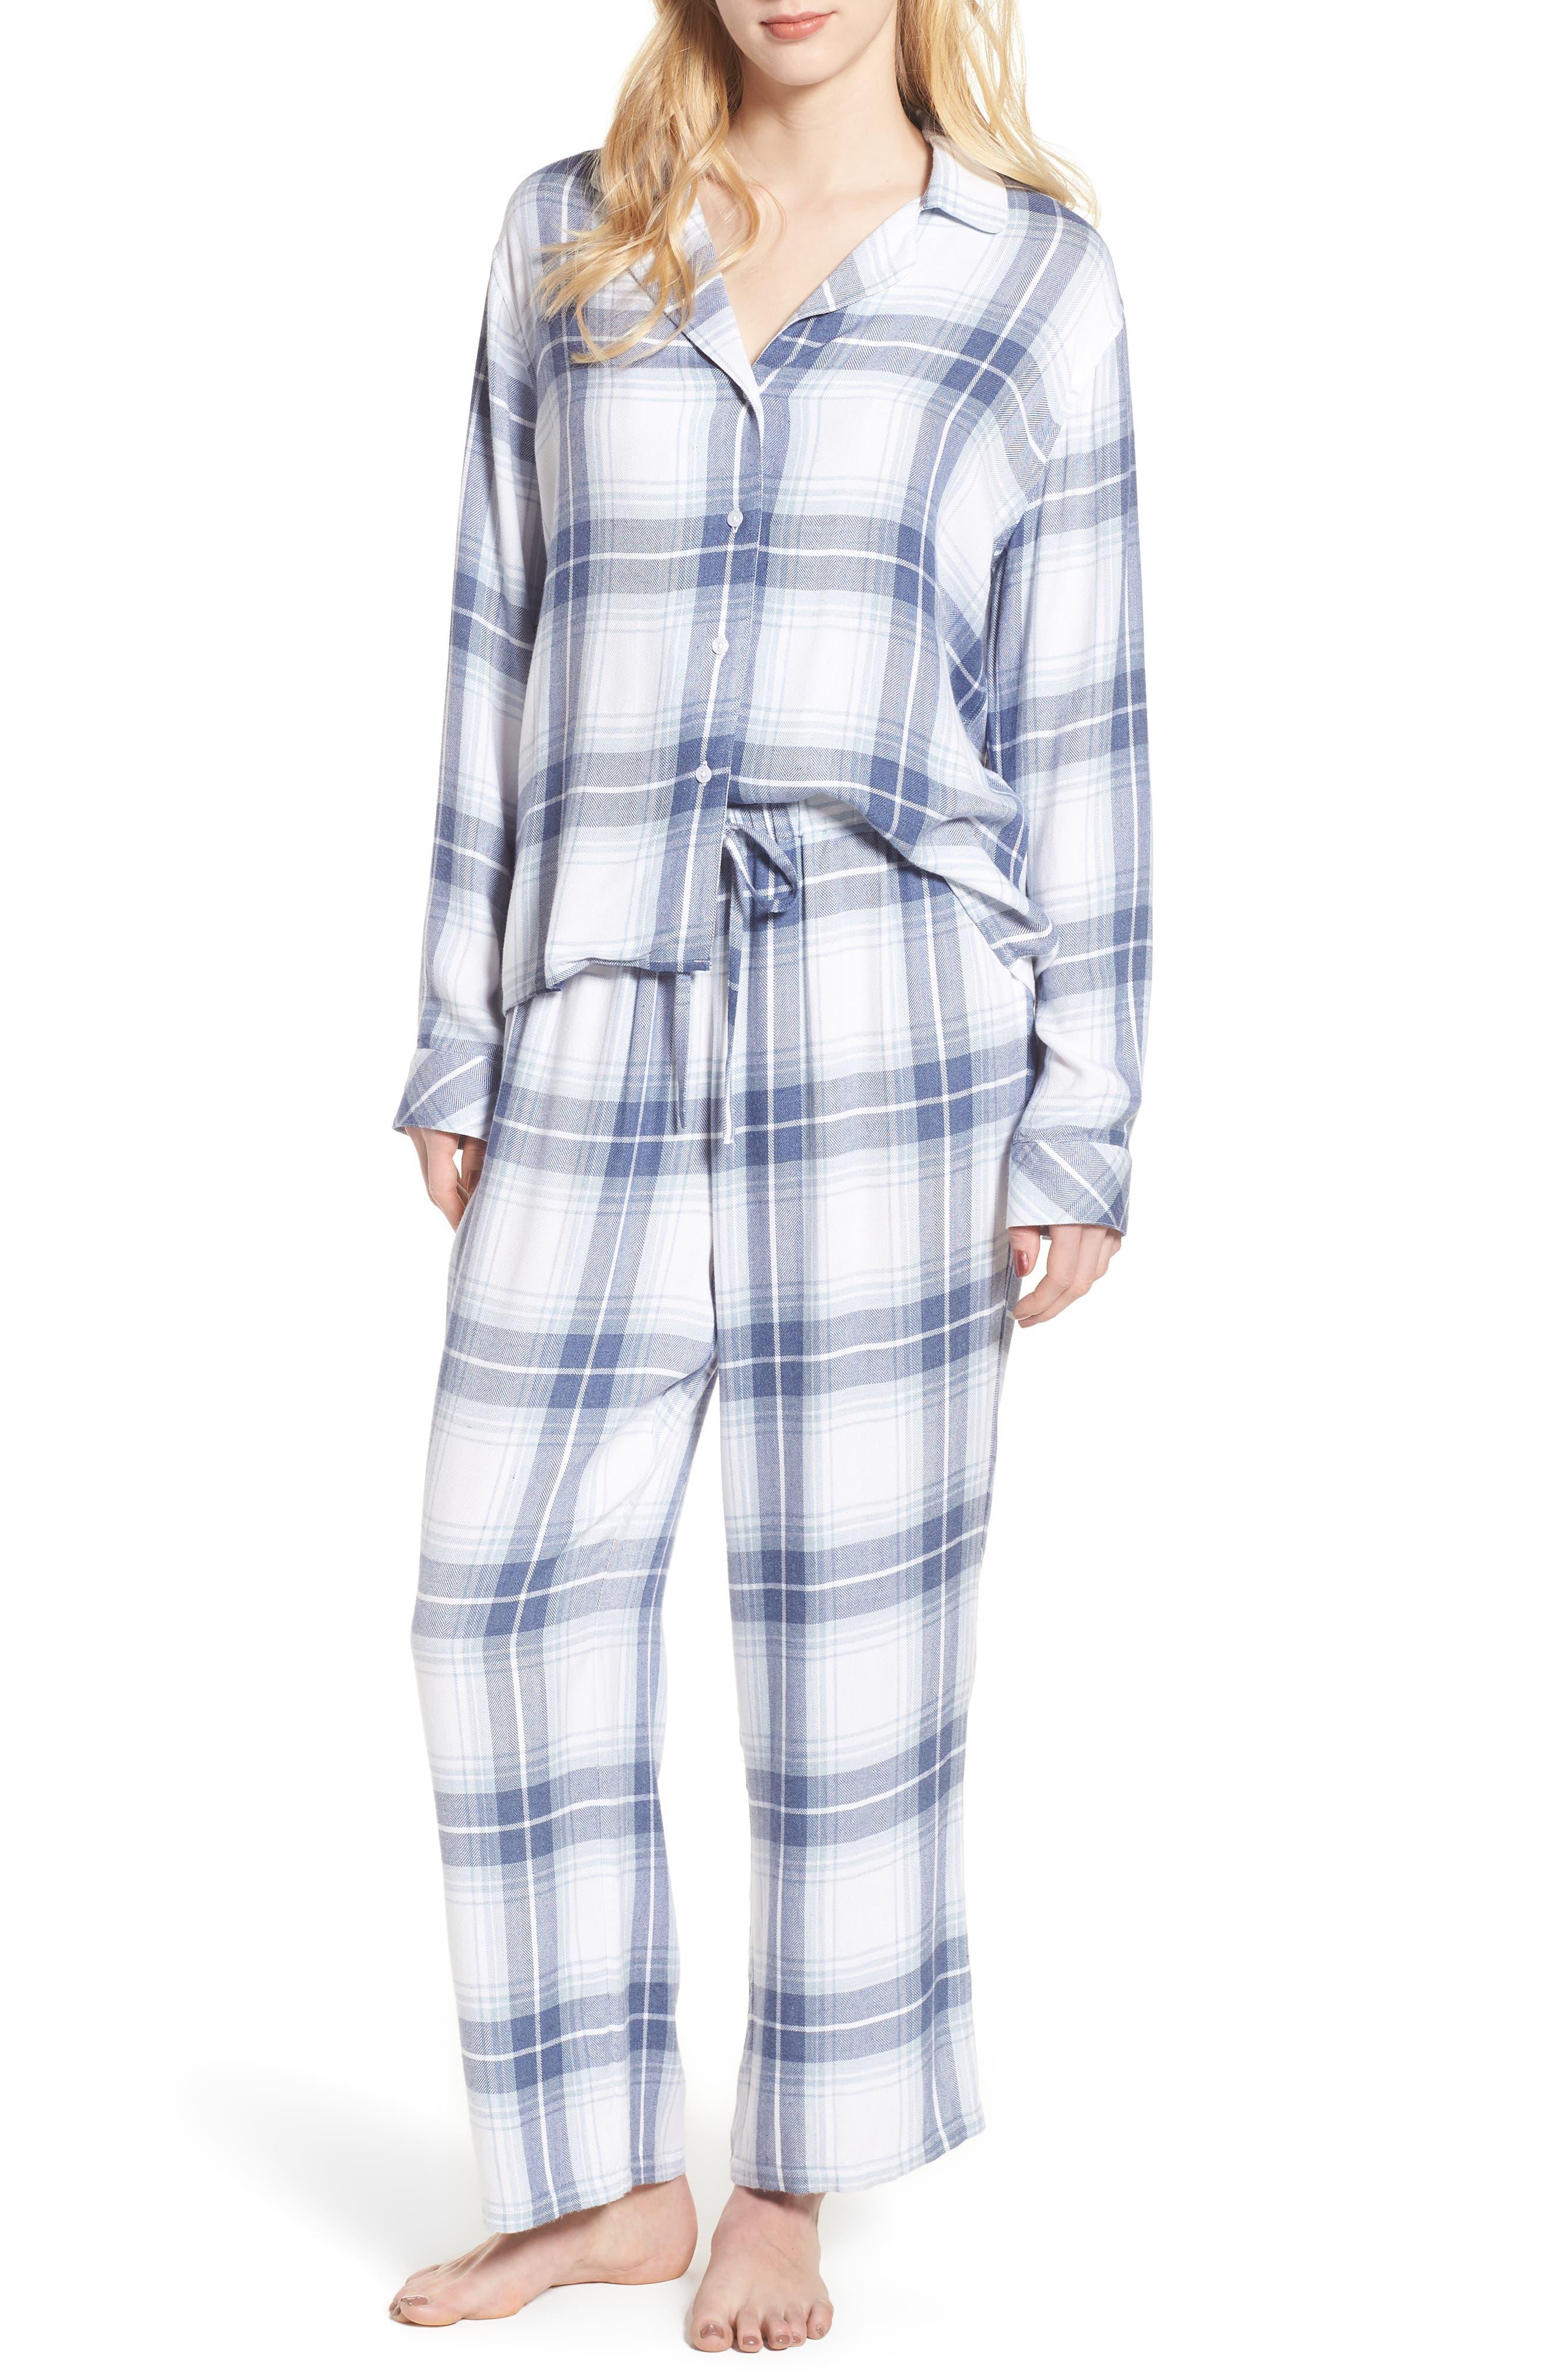 Plaid Pajamas,                             Main thumbnail 1, color,                             Pacific Sky White